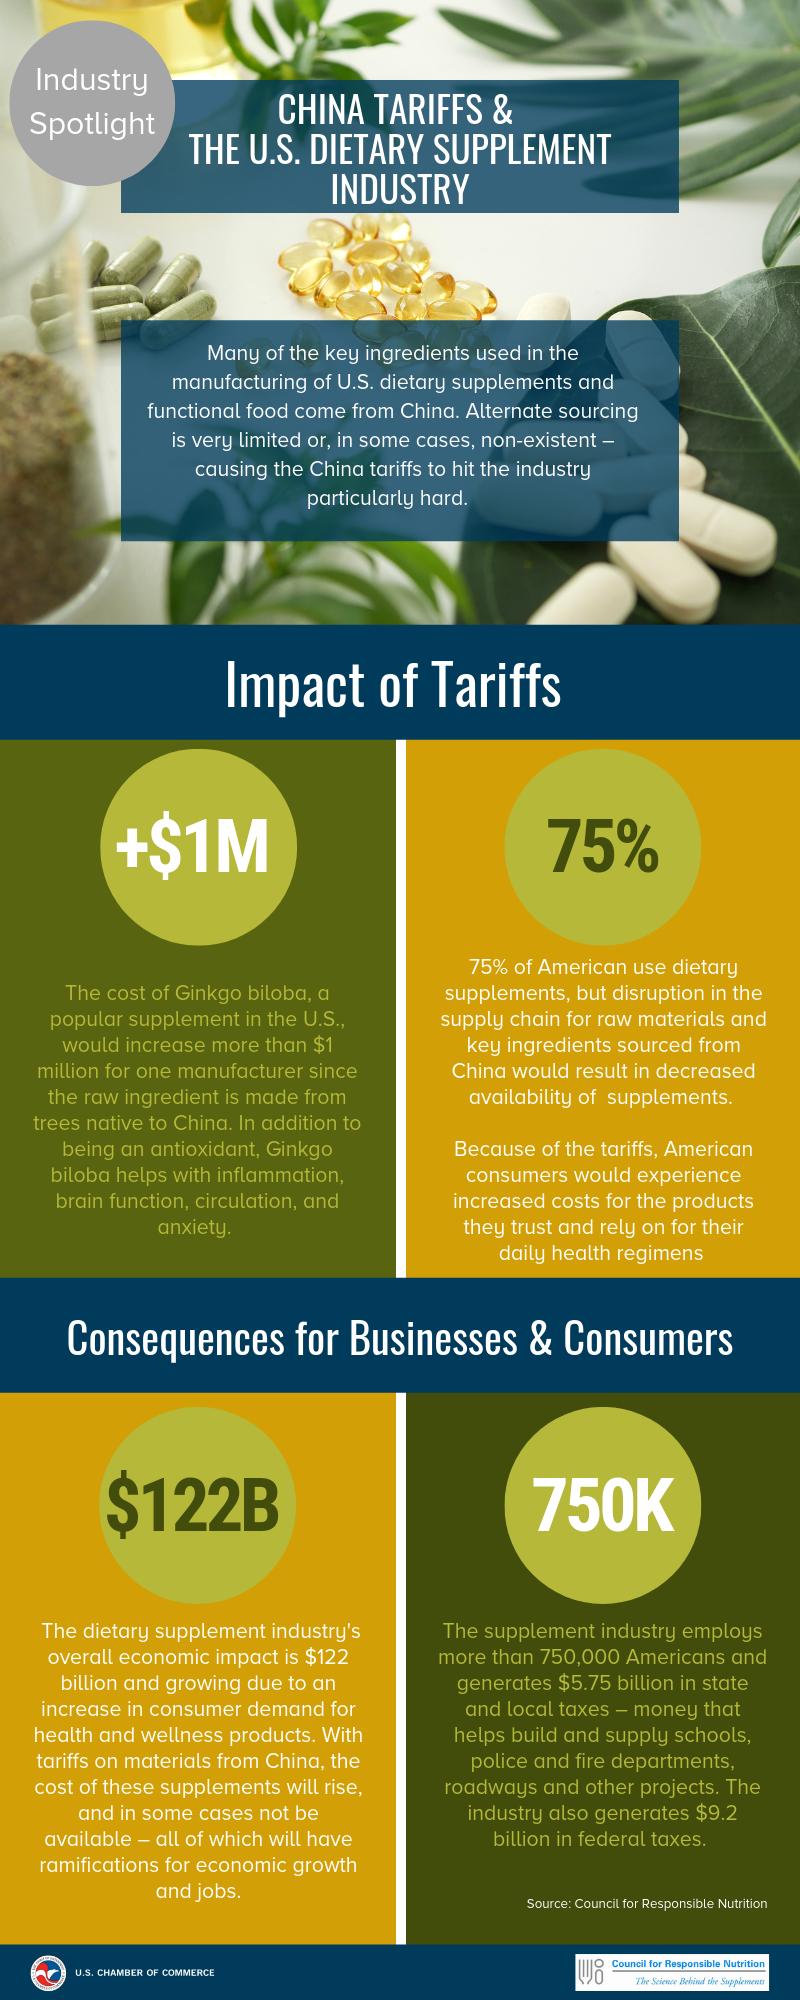 Tariffs & Dietary Supplement Industry